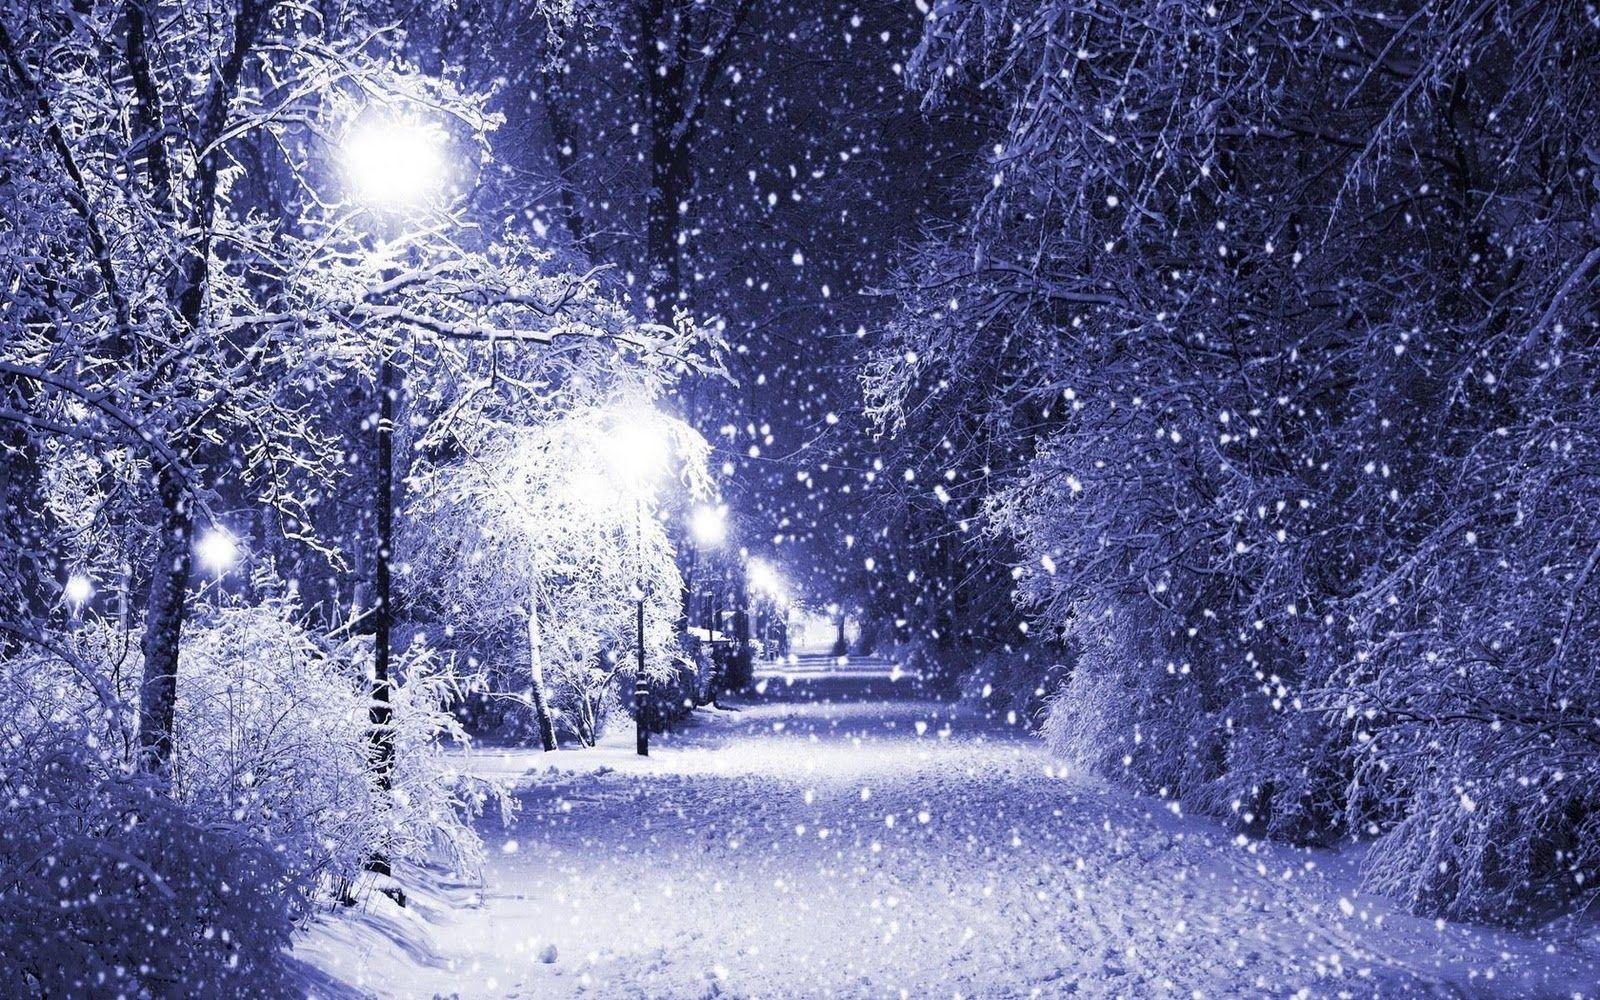 Winter Scenes Wallpaper 58 Backgrounds Wallruru Winter Scenery Winter Wallpaper Scenery Wallpaper